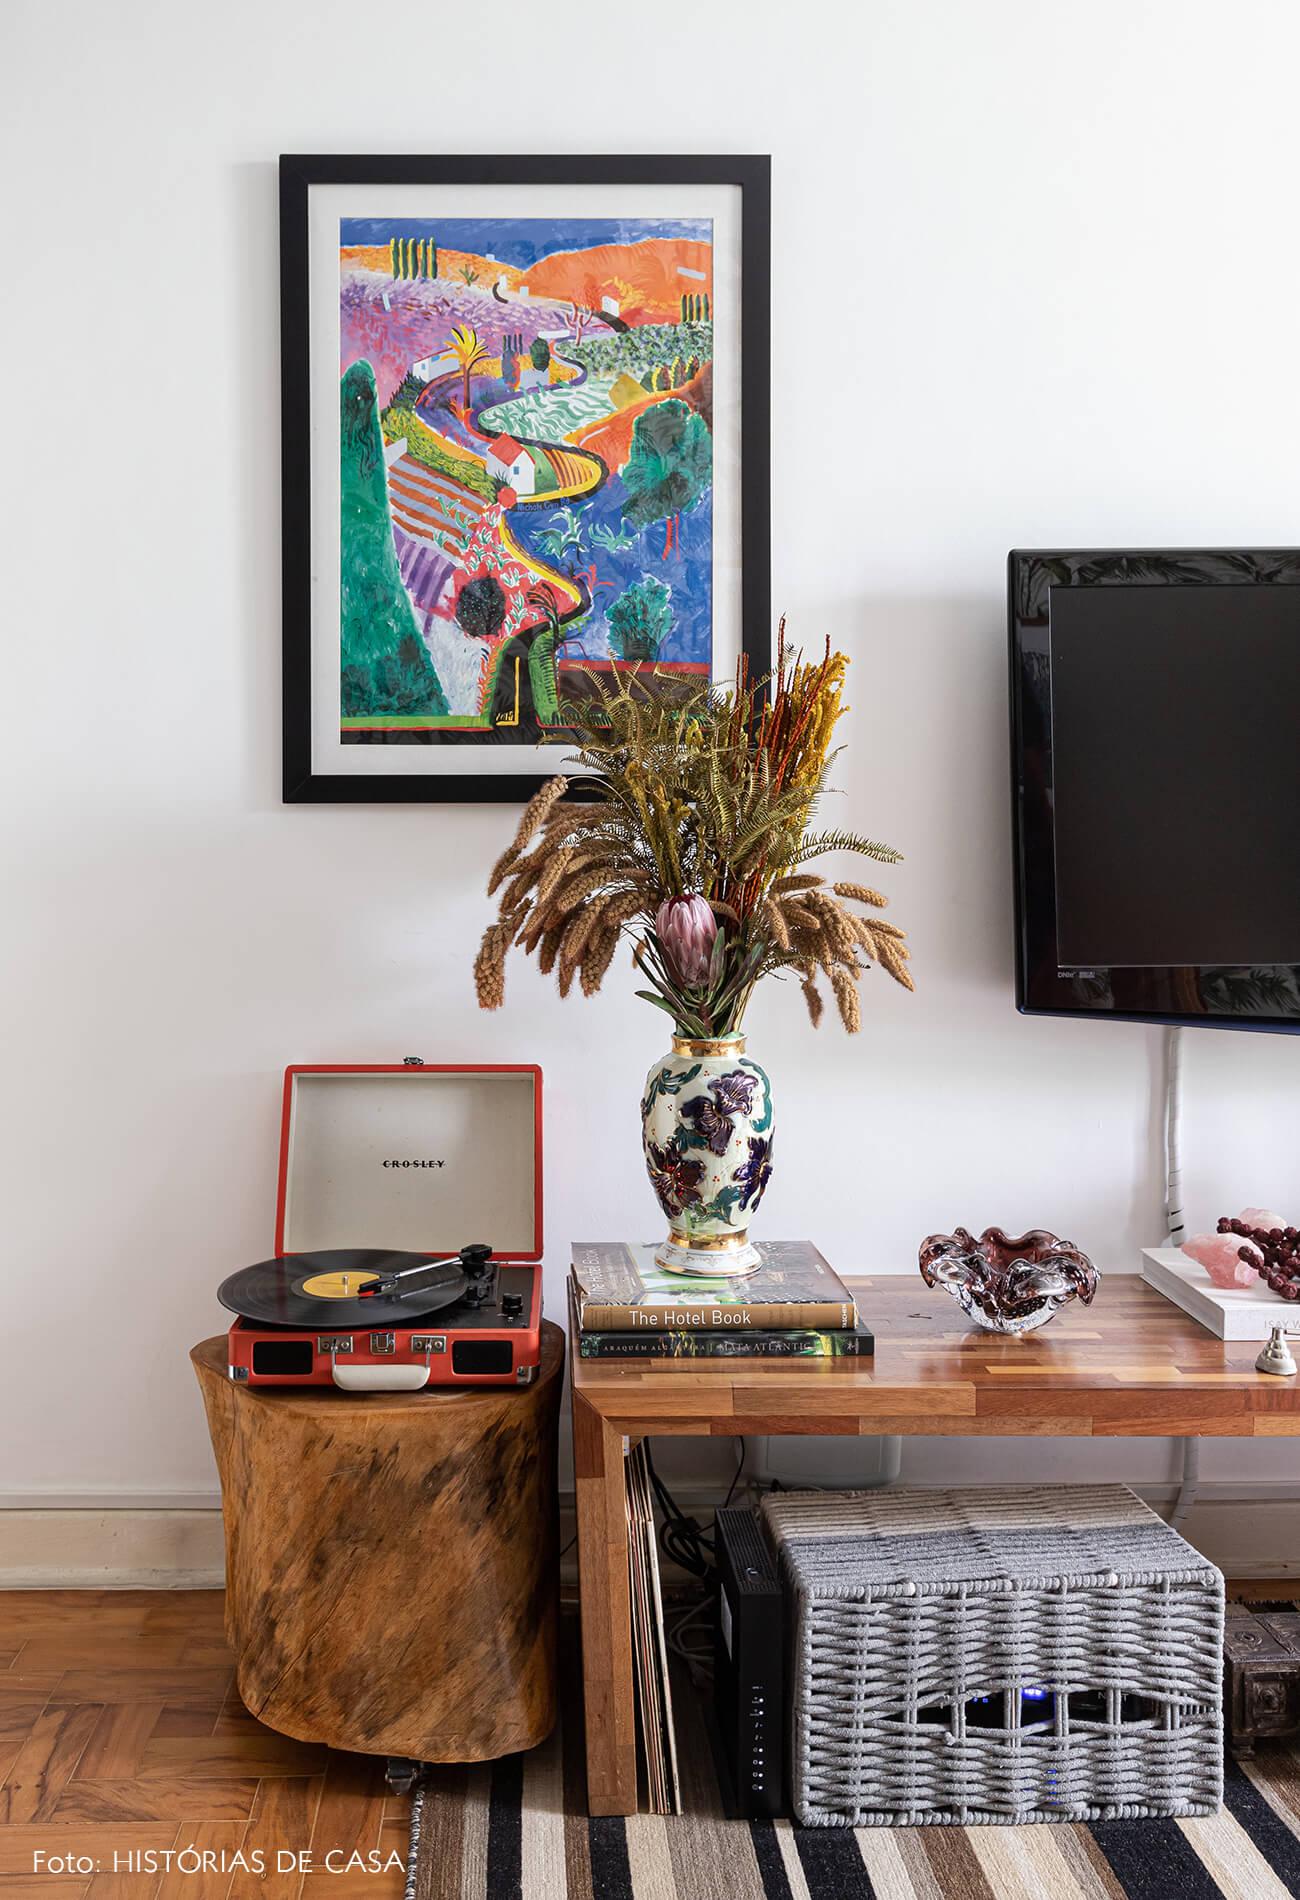 decoração sala tv banco tronco arvore